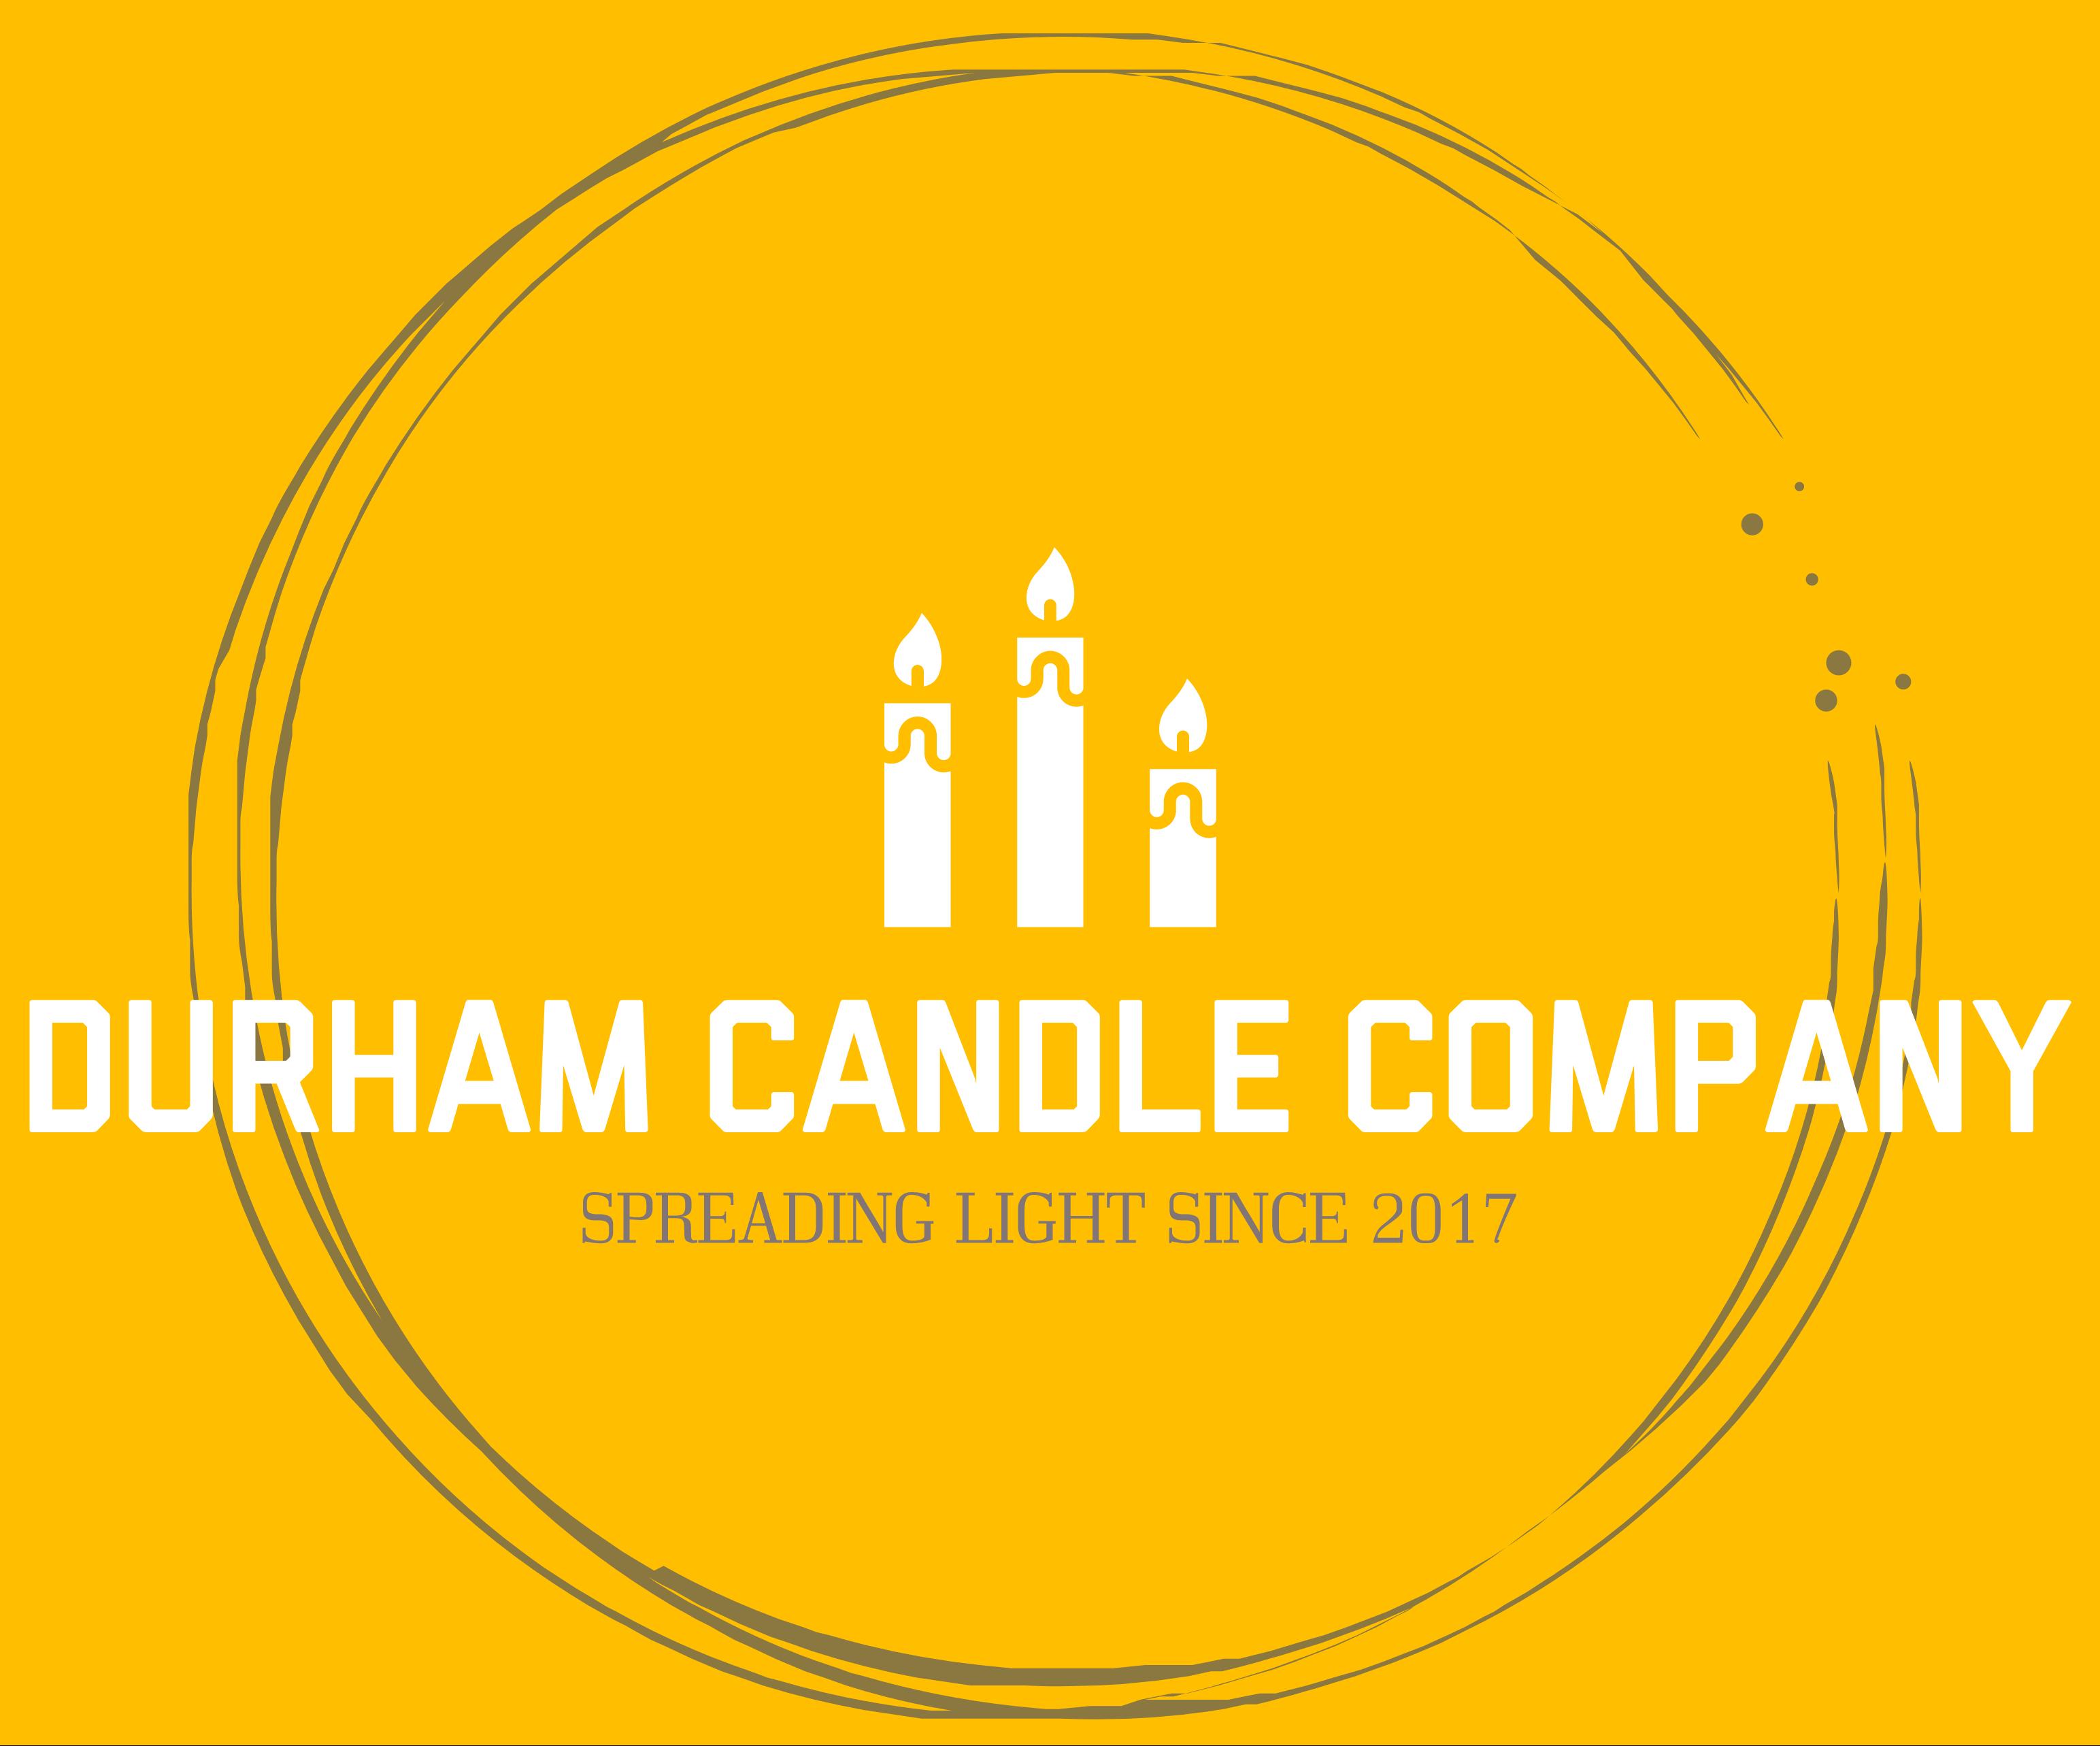 Durham Candle Company